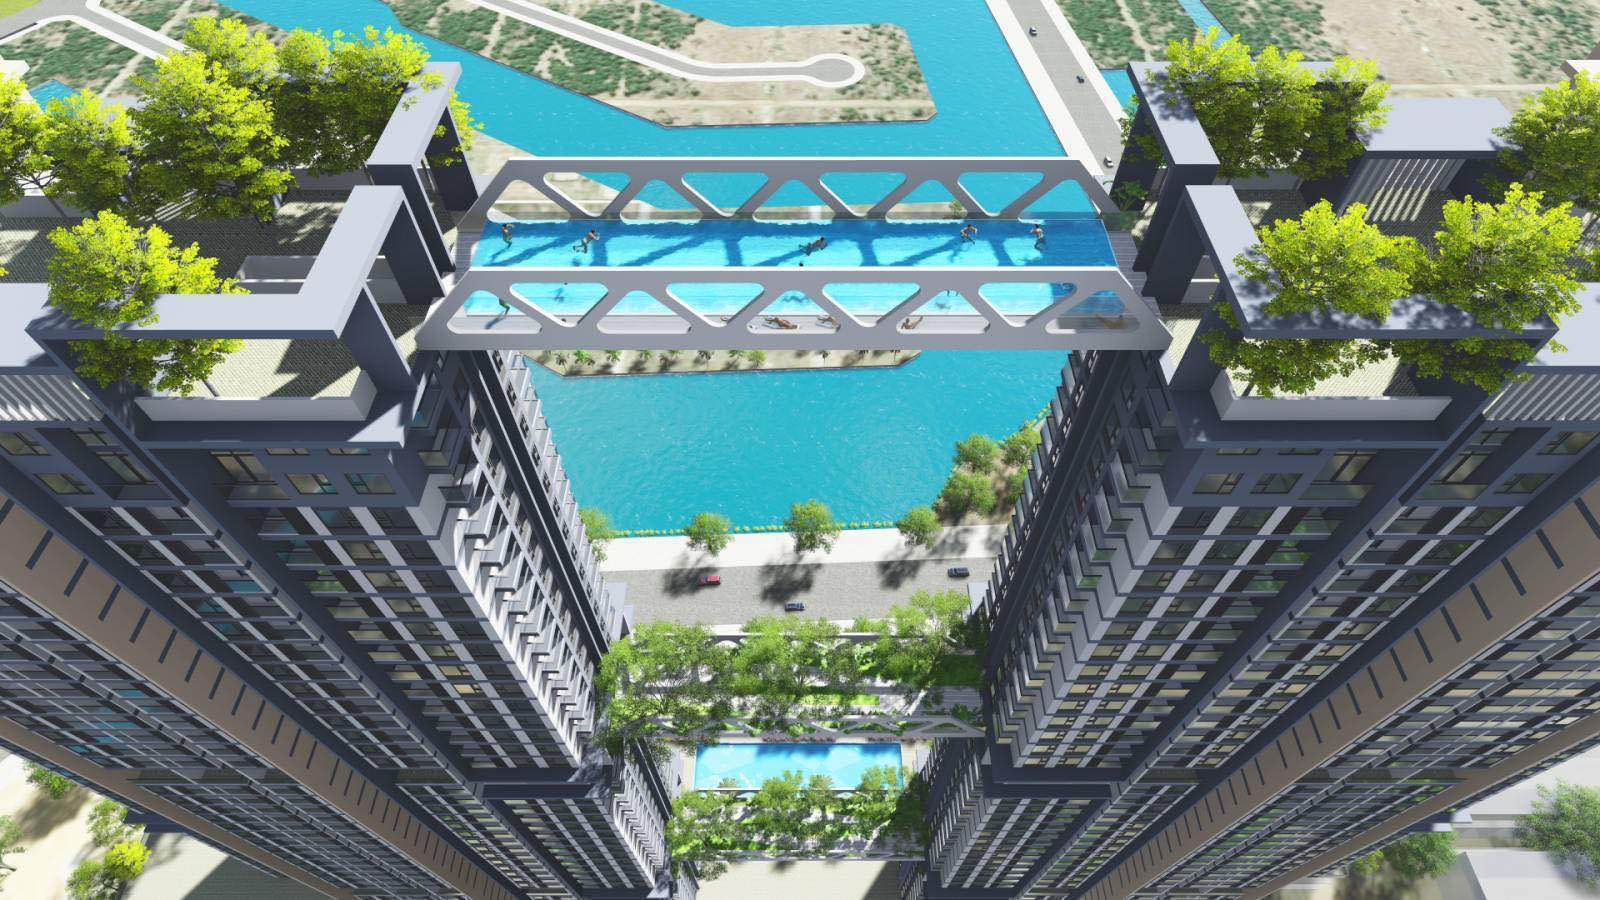 bể bơi vô cực sky oasis